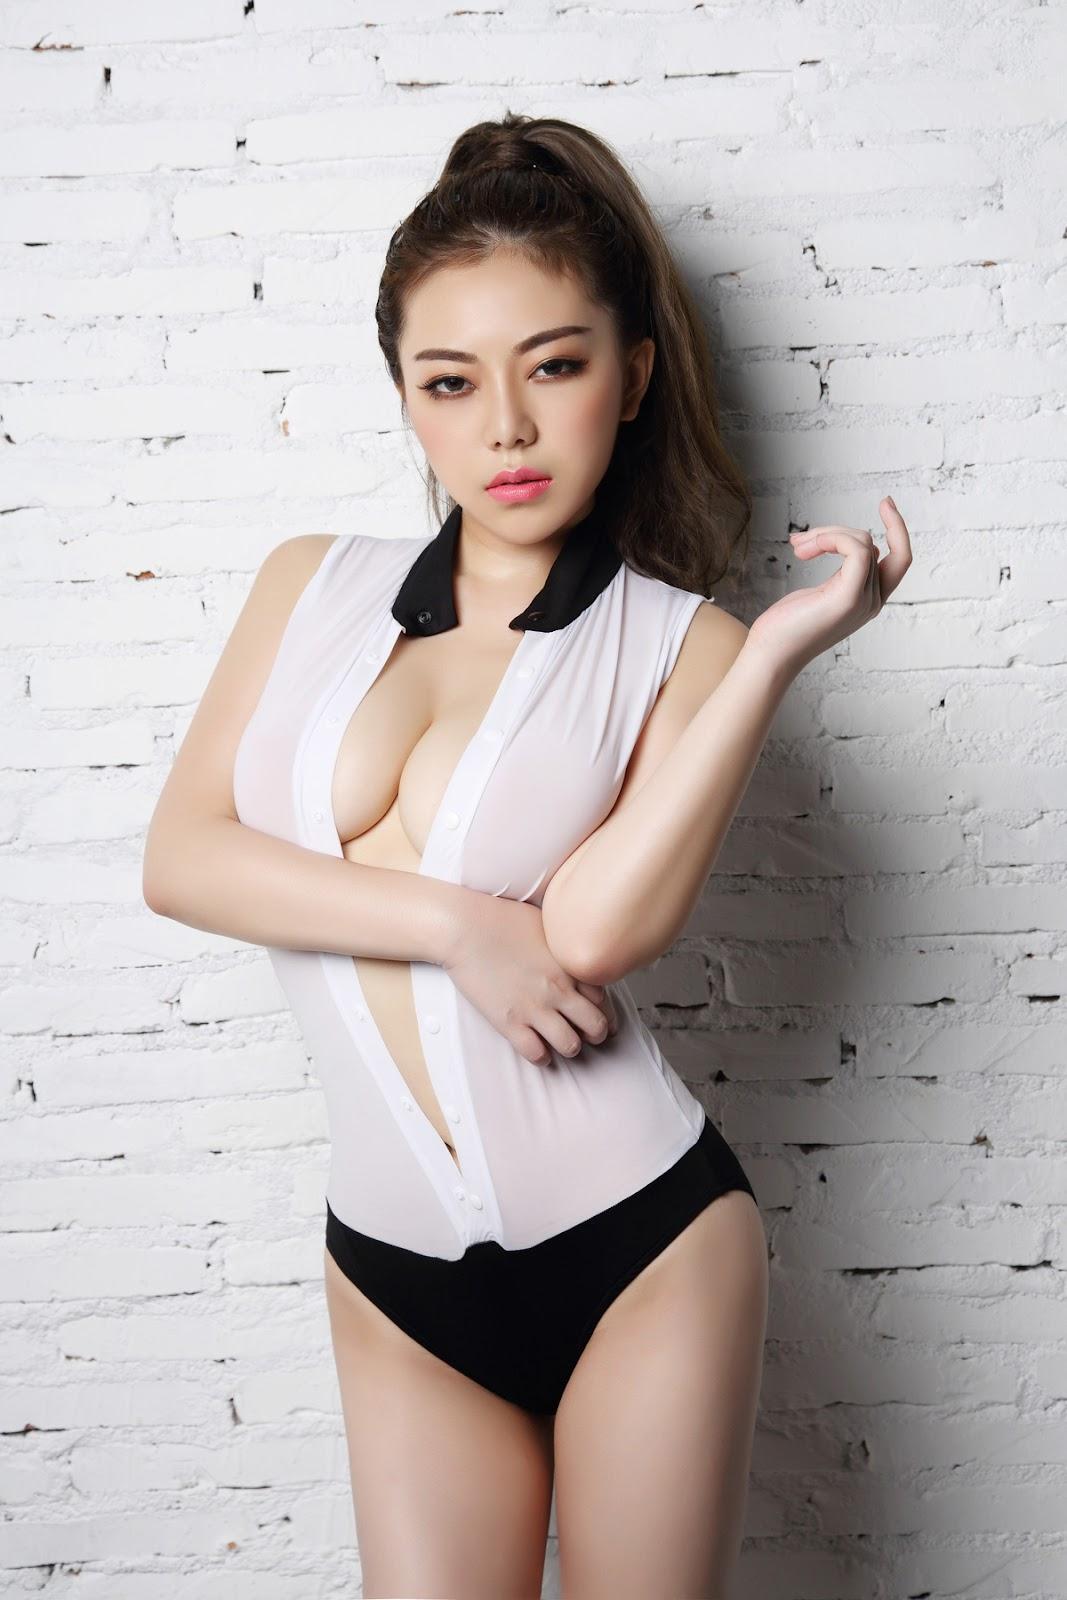 %2529%252B%252B%25C2%25A6%25C2%25B7 05 - TGOD Sexy Nude FAYE